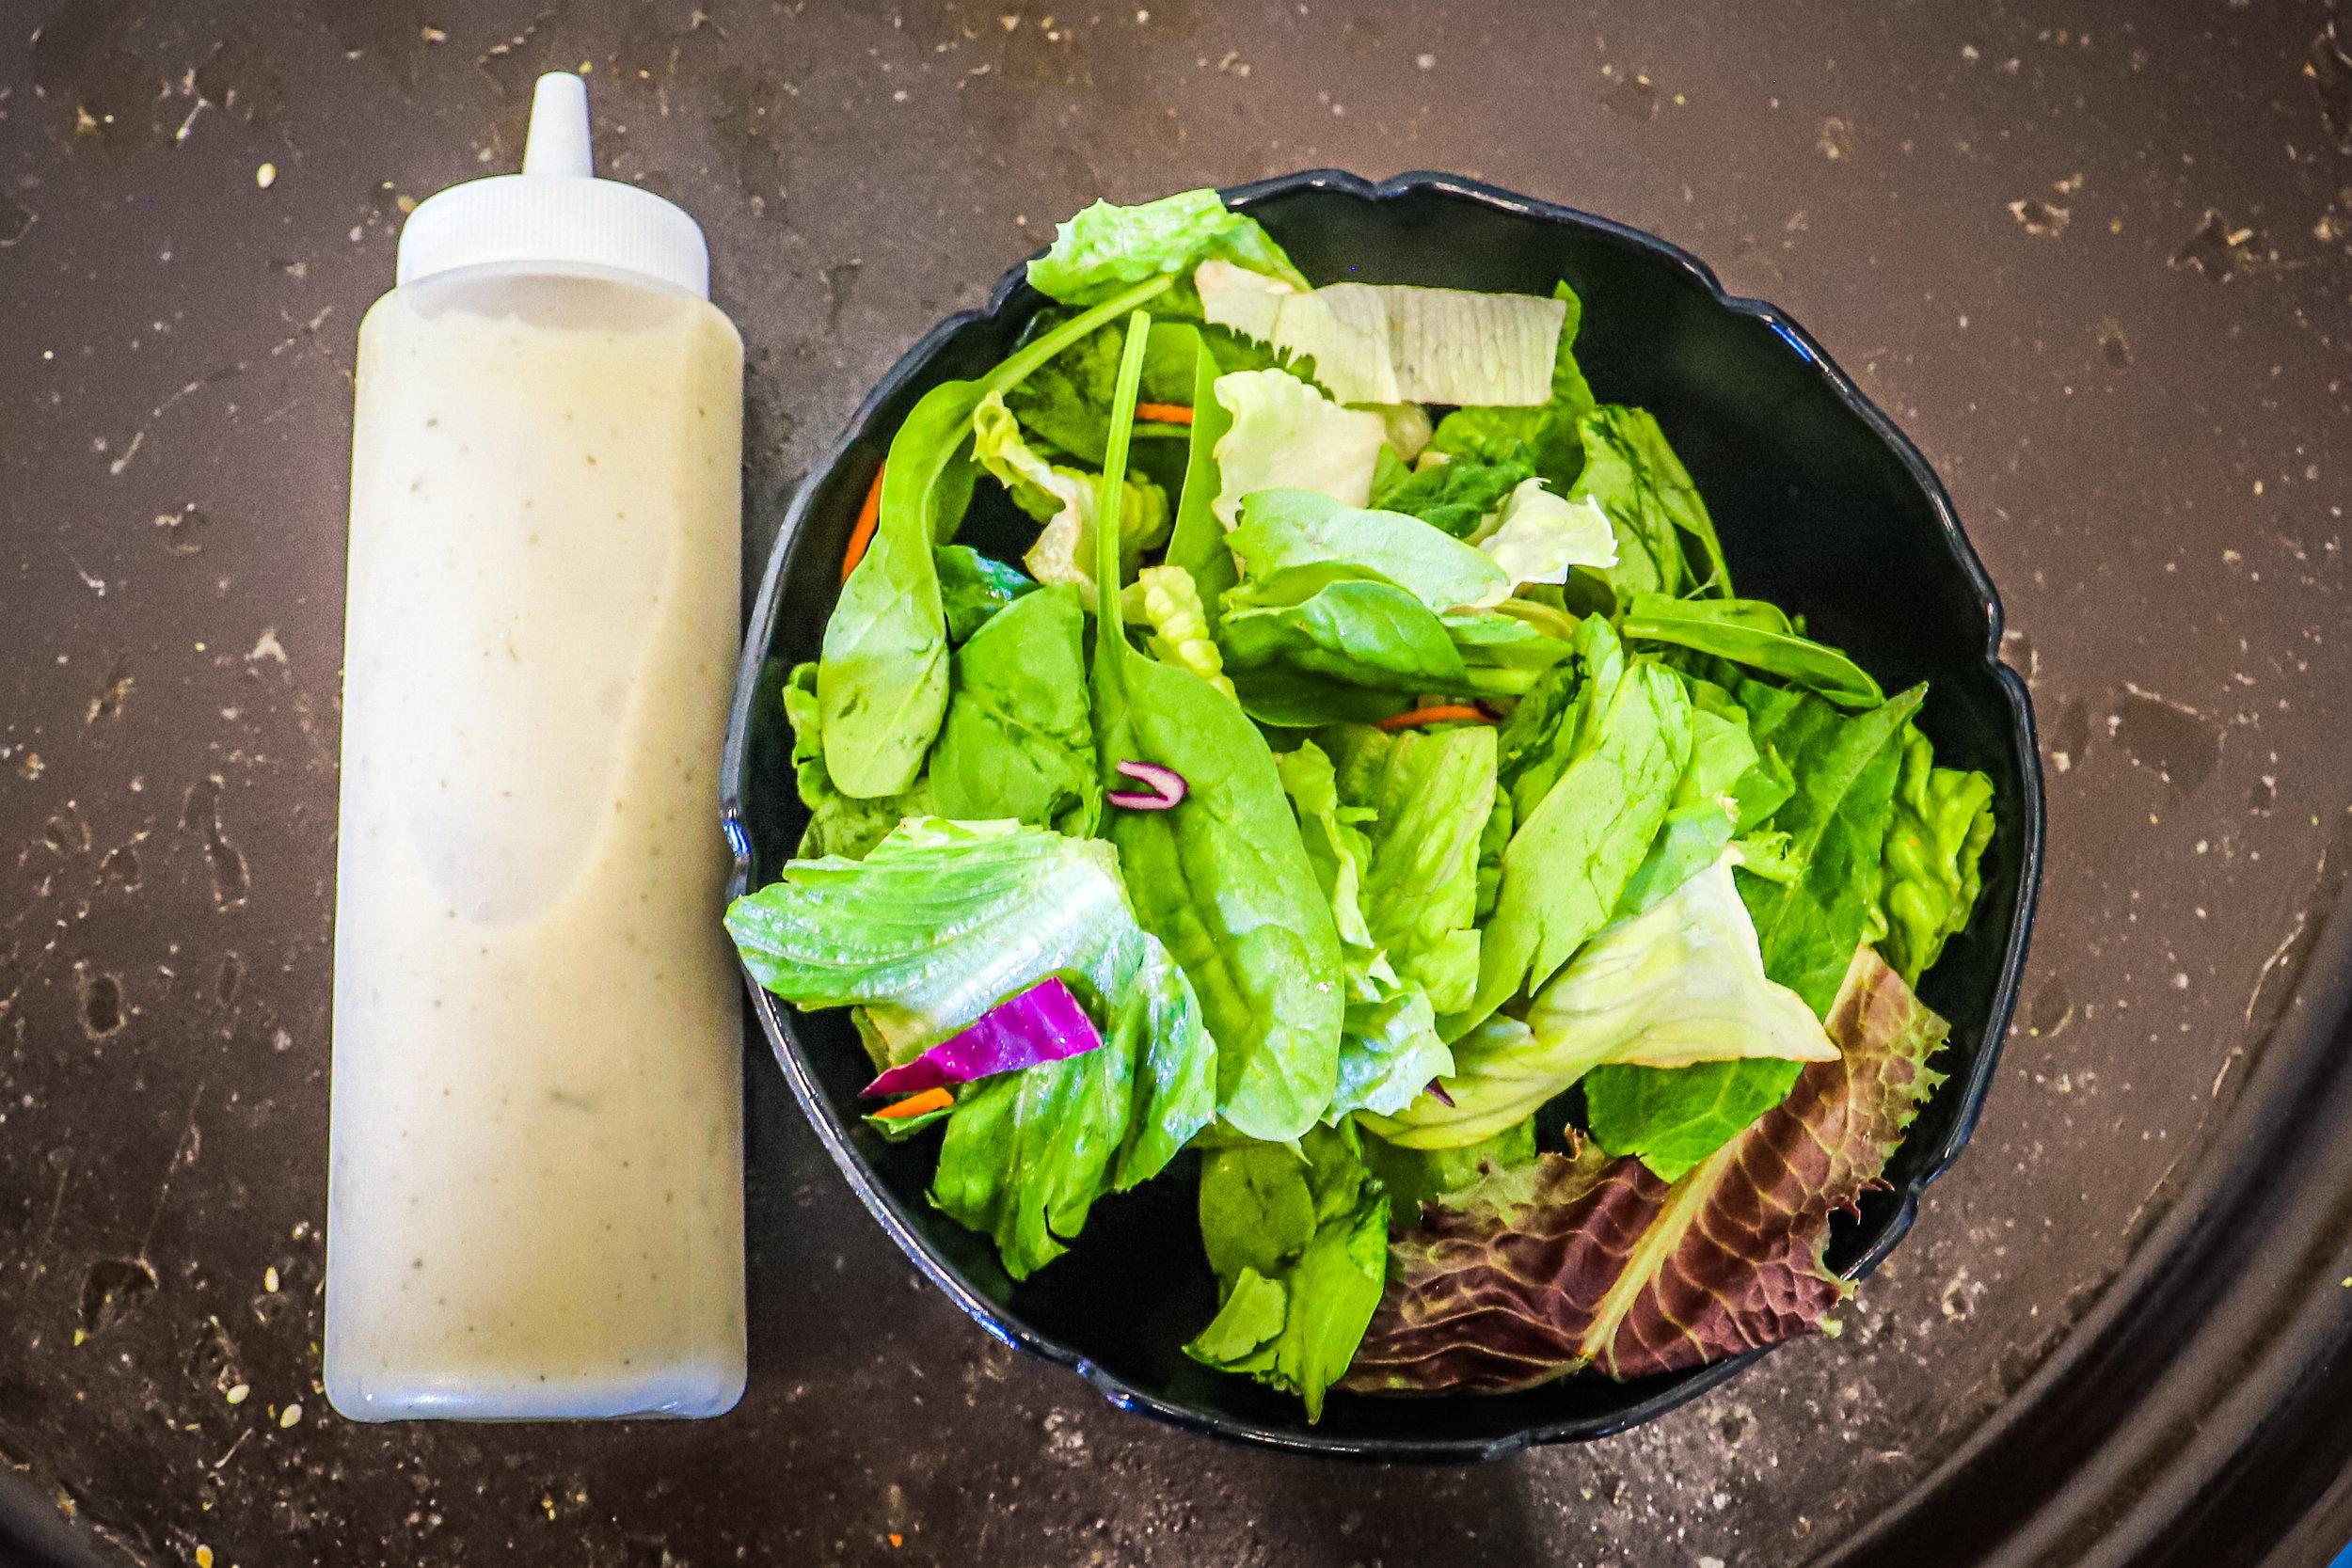 Trilogy's Homemade Salad Dressing